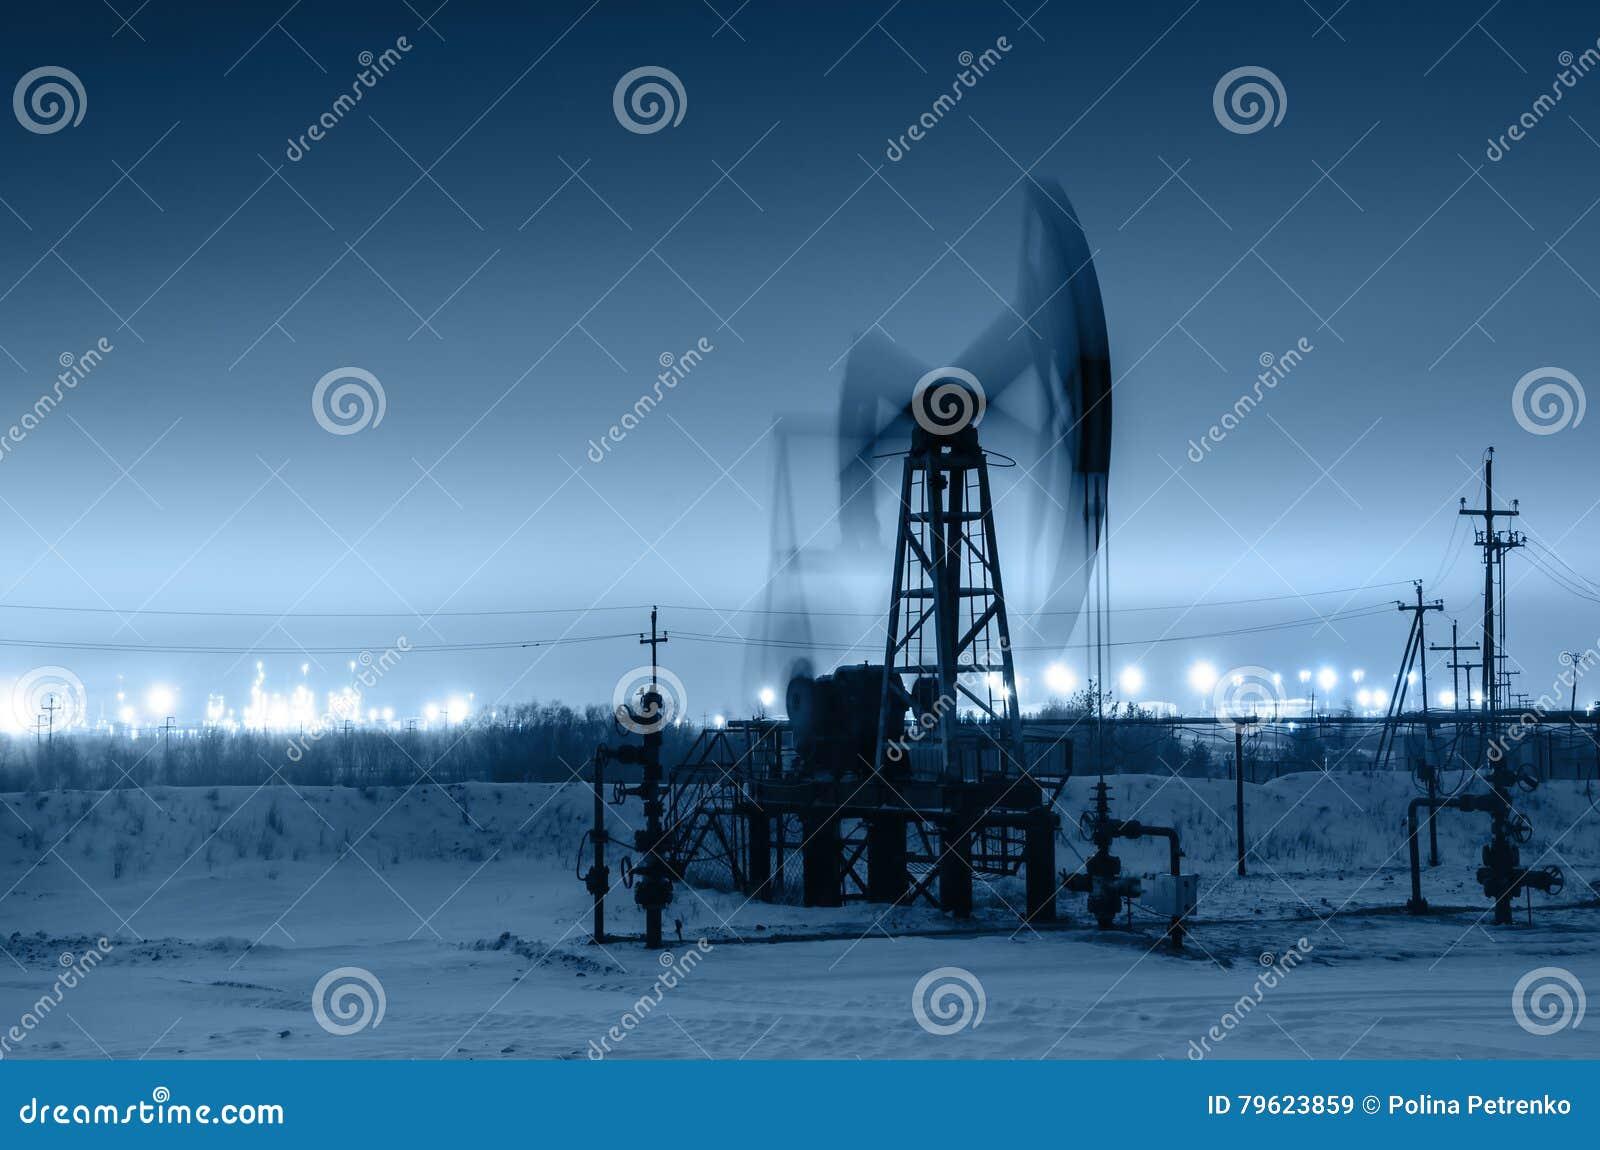 working-oil-pump-jack-night-time-oilfiel